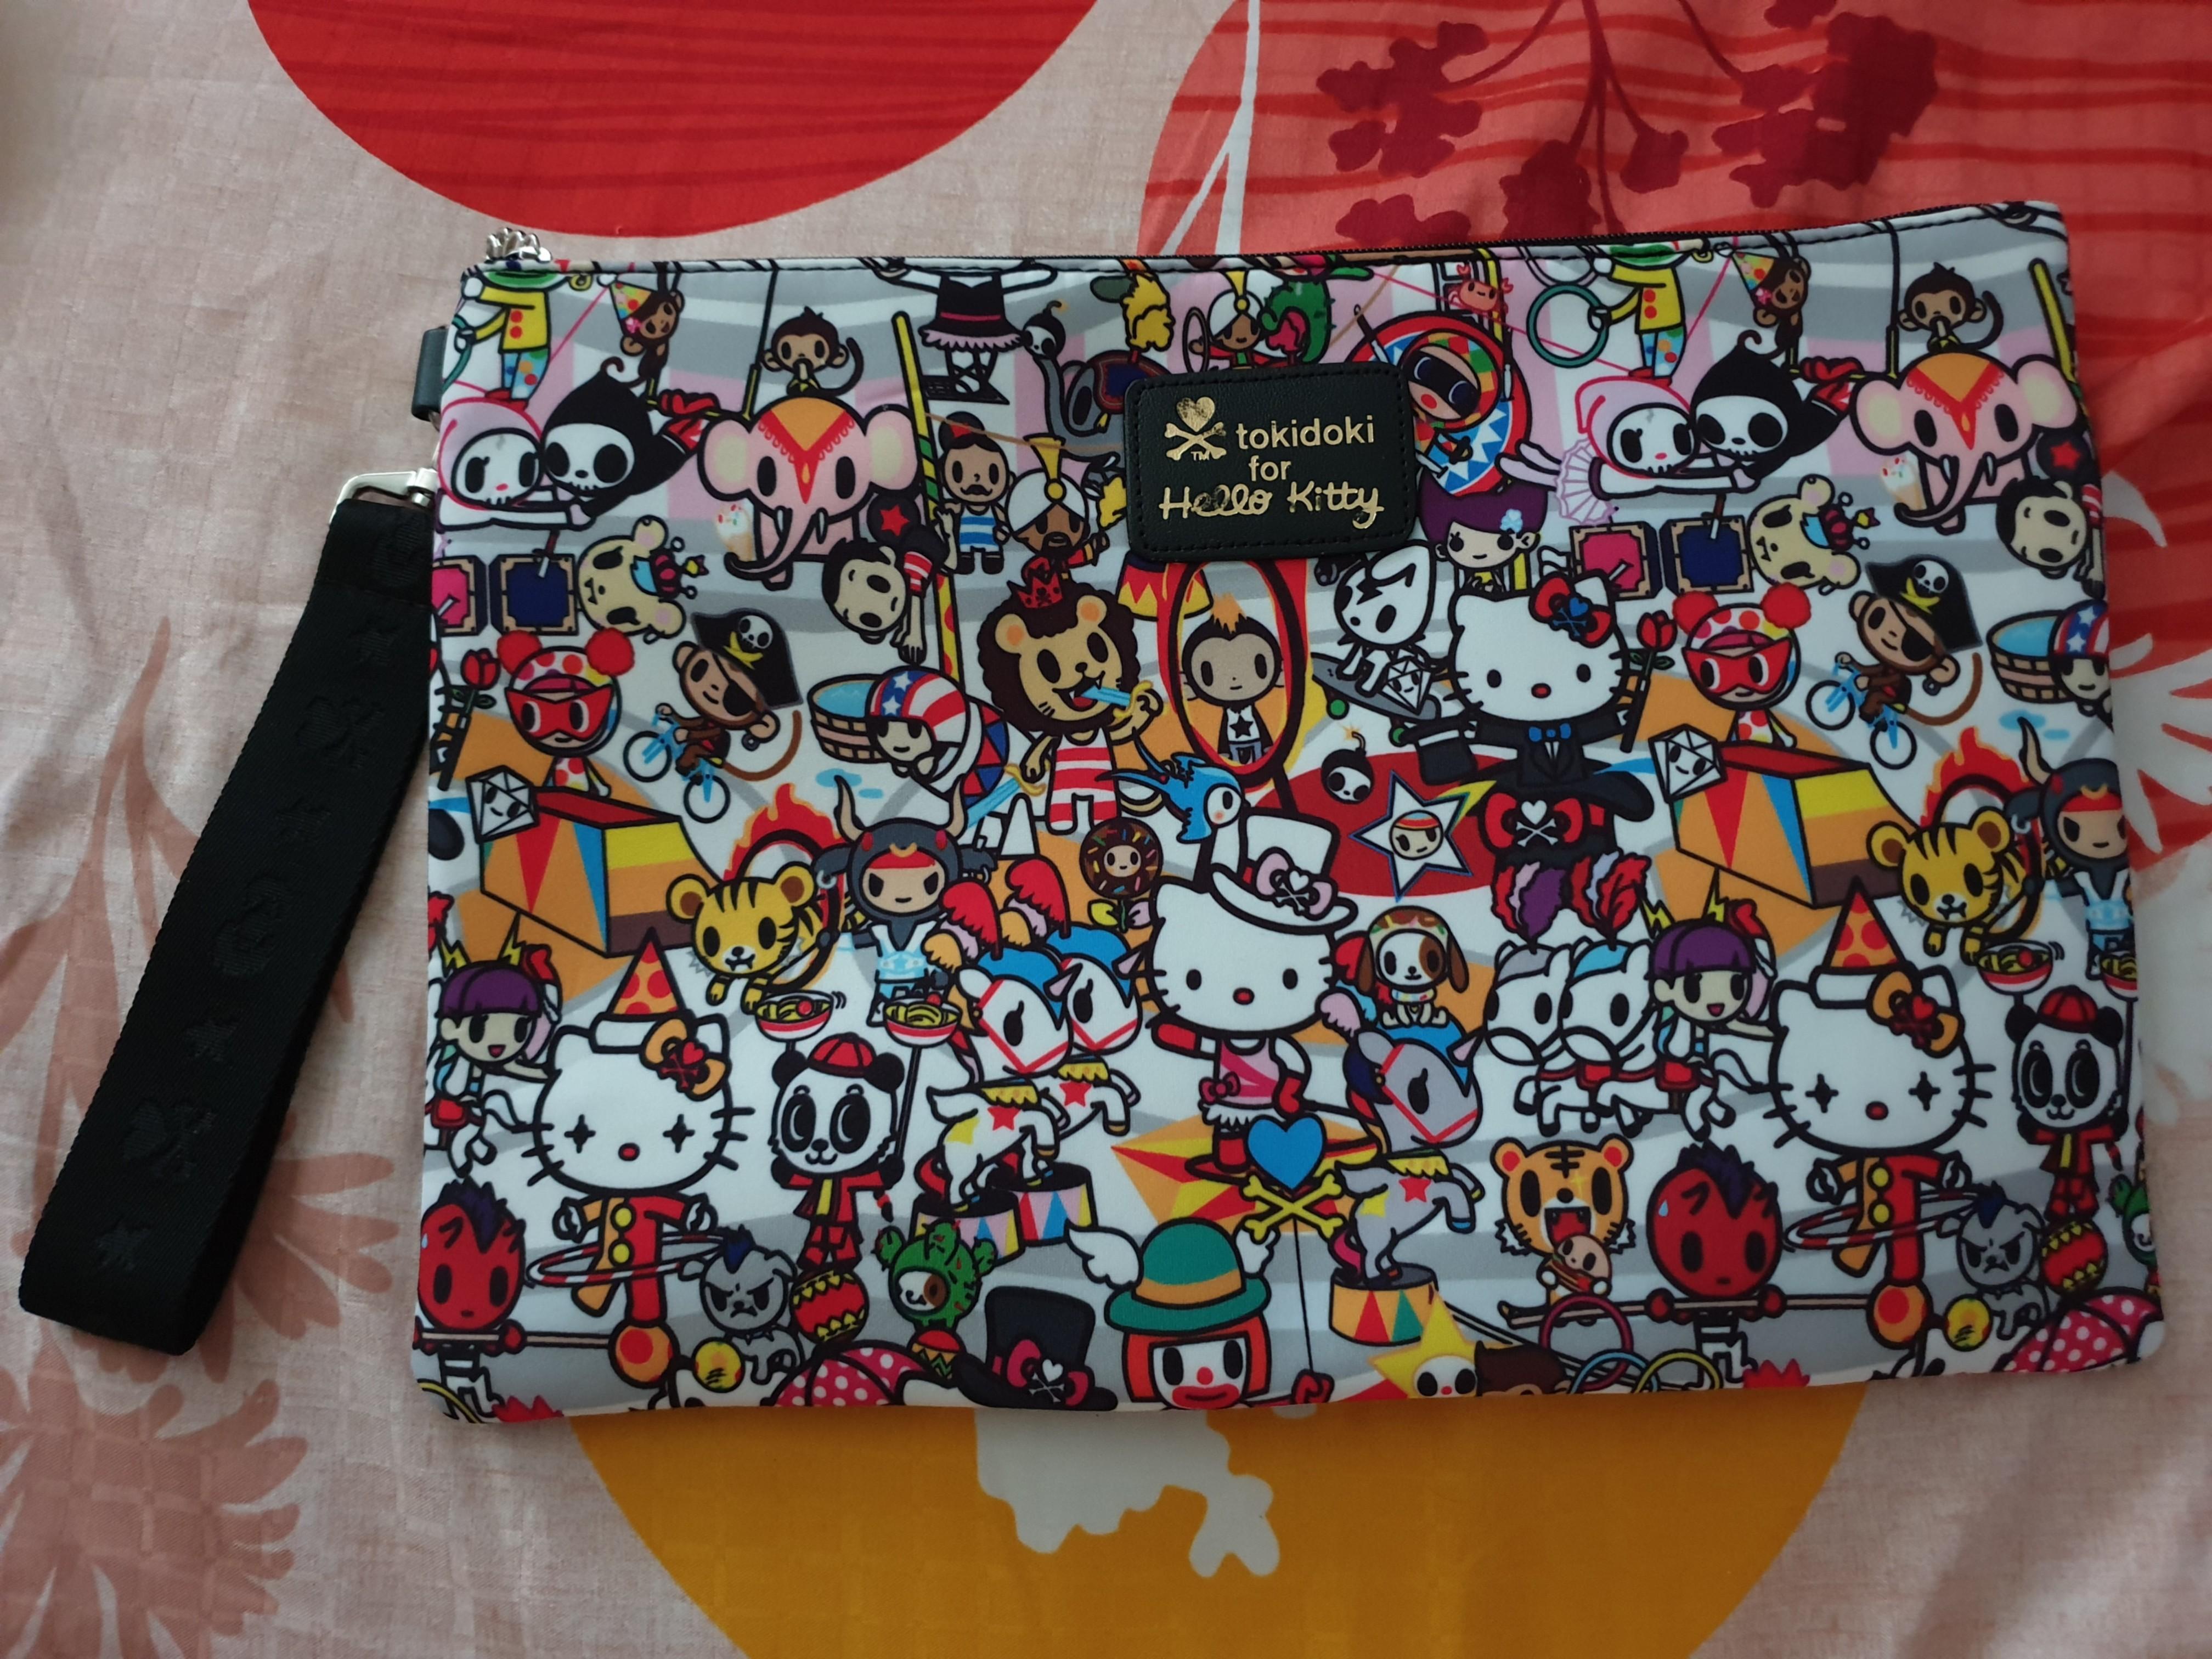 Tokidoki x Hello Kitty Clutch Jujube 3c9e23cbf3263